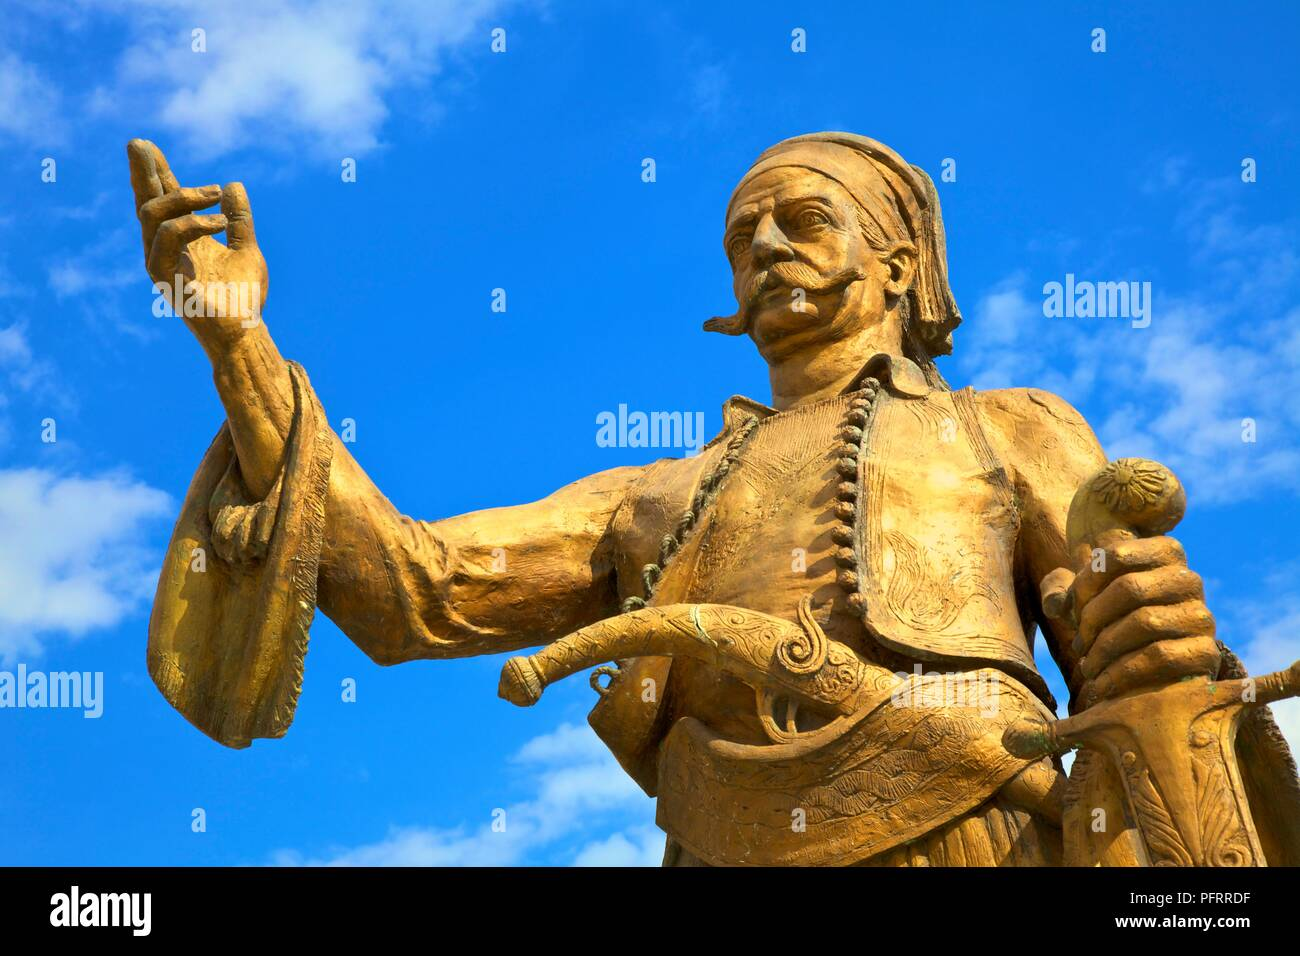 The Statue of the Famous Greek Hero Petros Mavromichalis, Areopoli, Mani Peninsula, The Peloponnese, Greece, Southern Europe - Stock Image